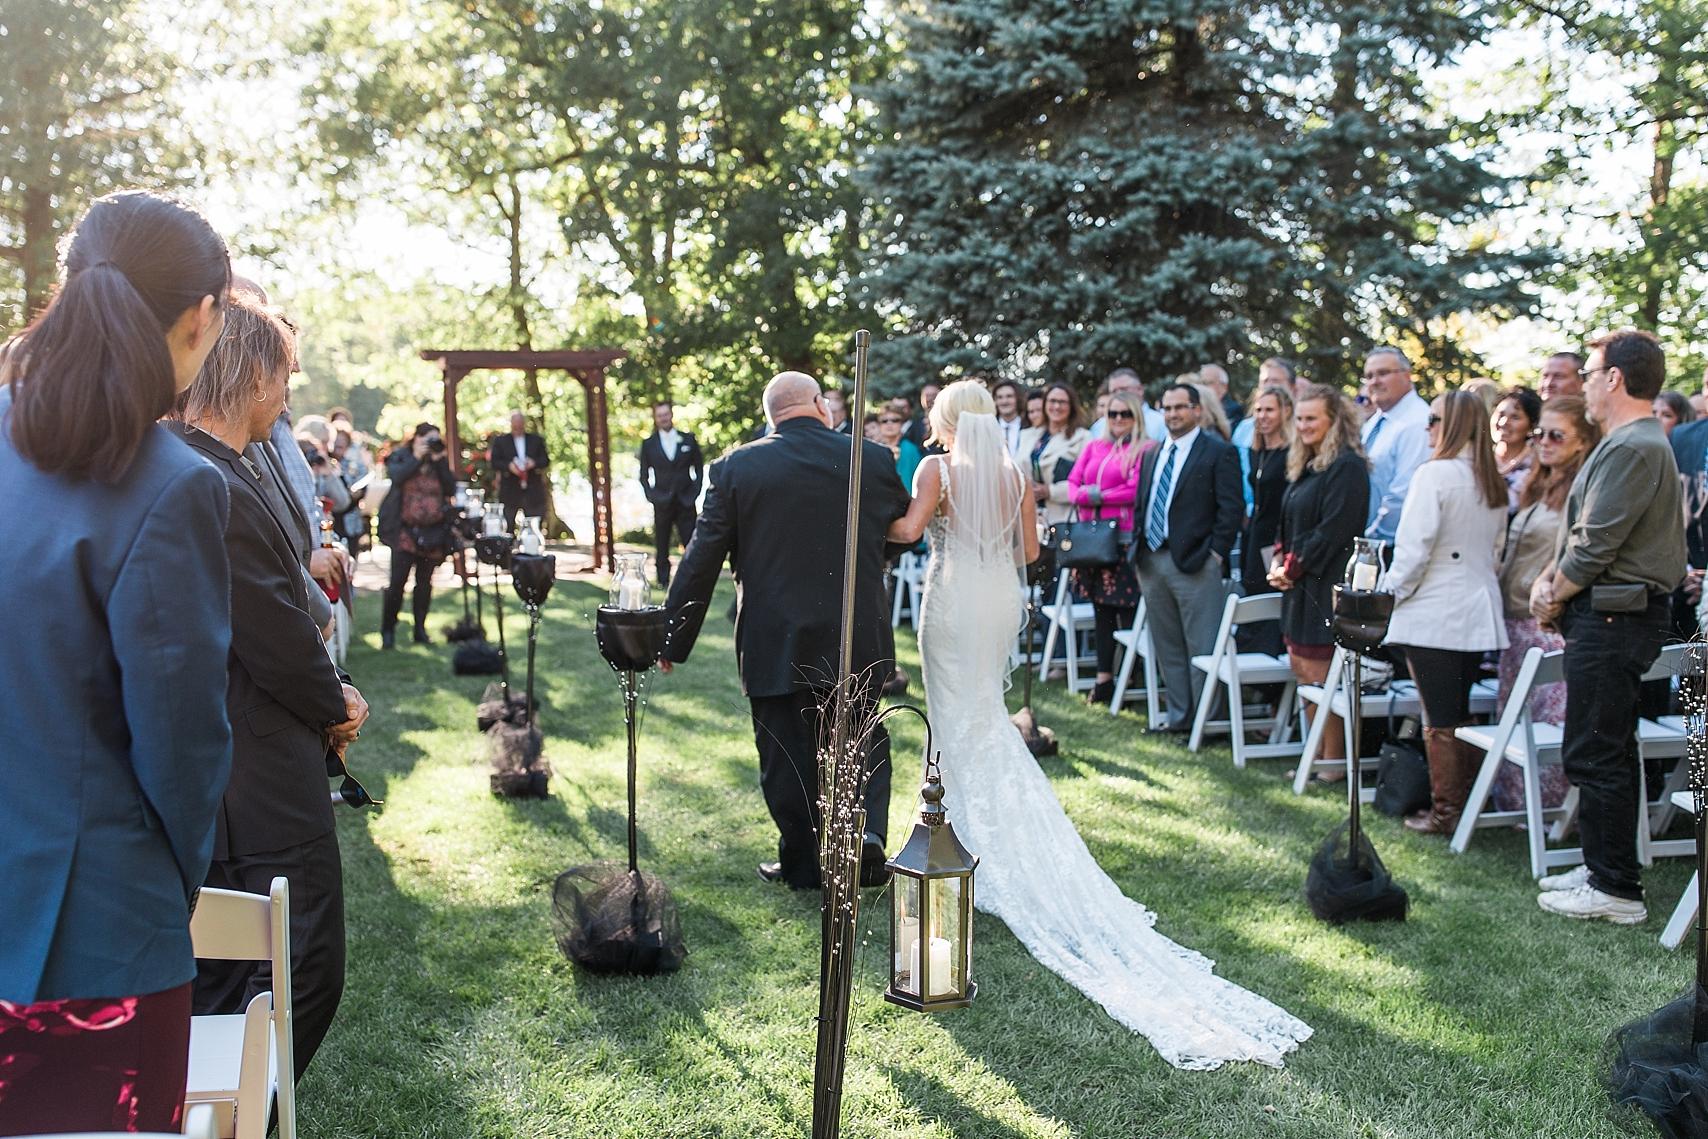 Outdoor wedding ceremony bride walking down aisle at the Chart House Summer Wedding Lakeville Minnesota Minneapolis Wedding Photographer Mallory Kiesow